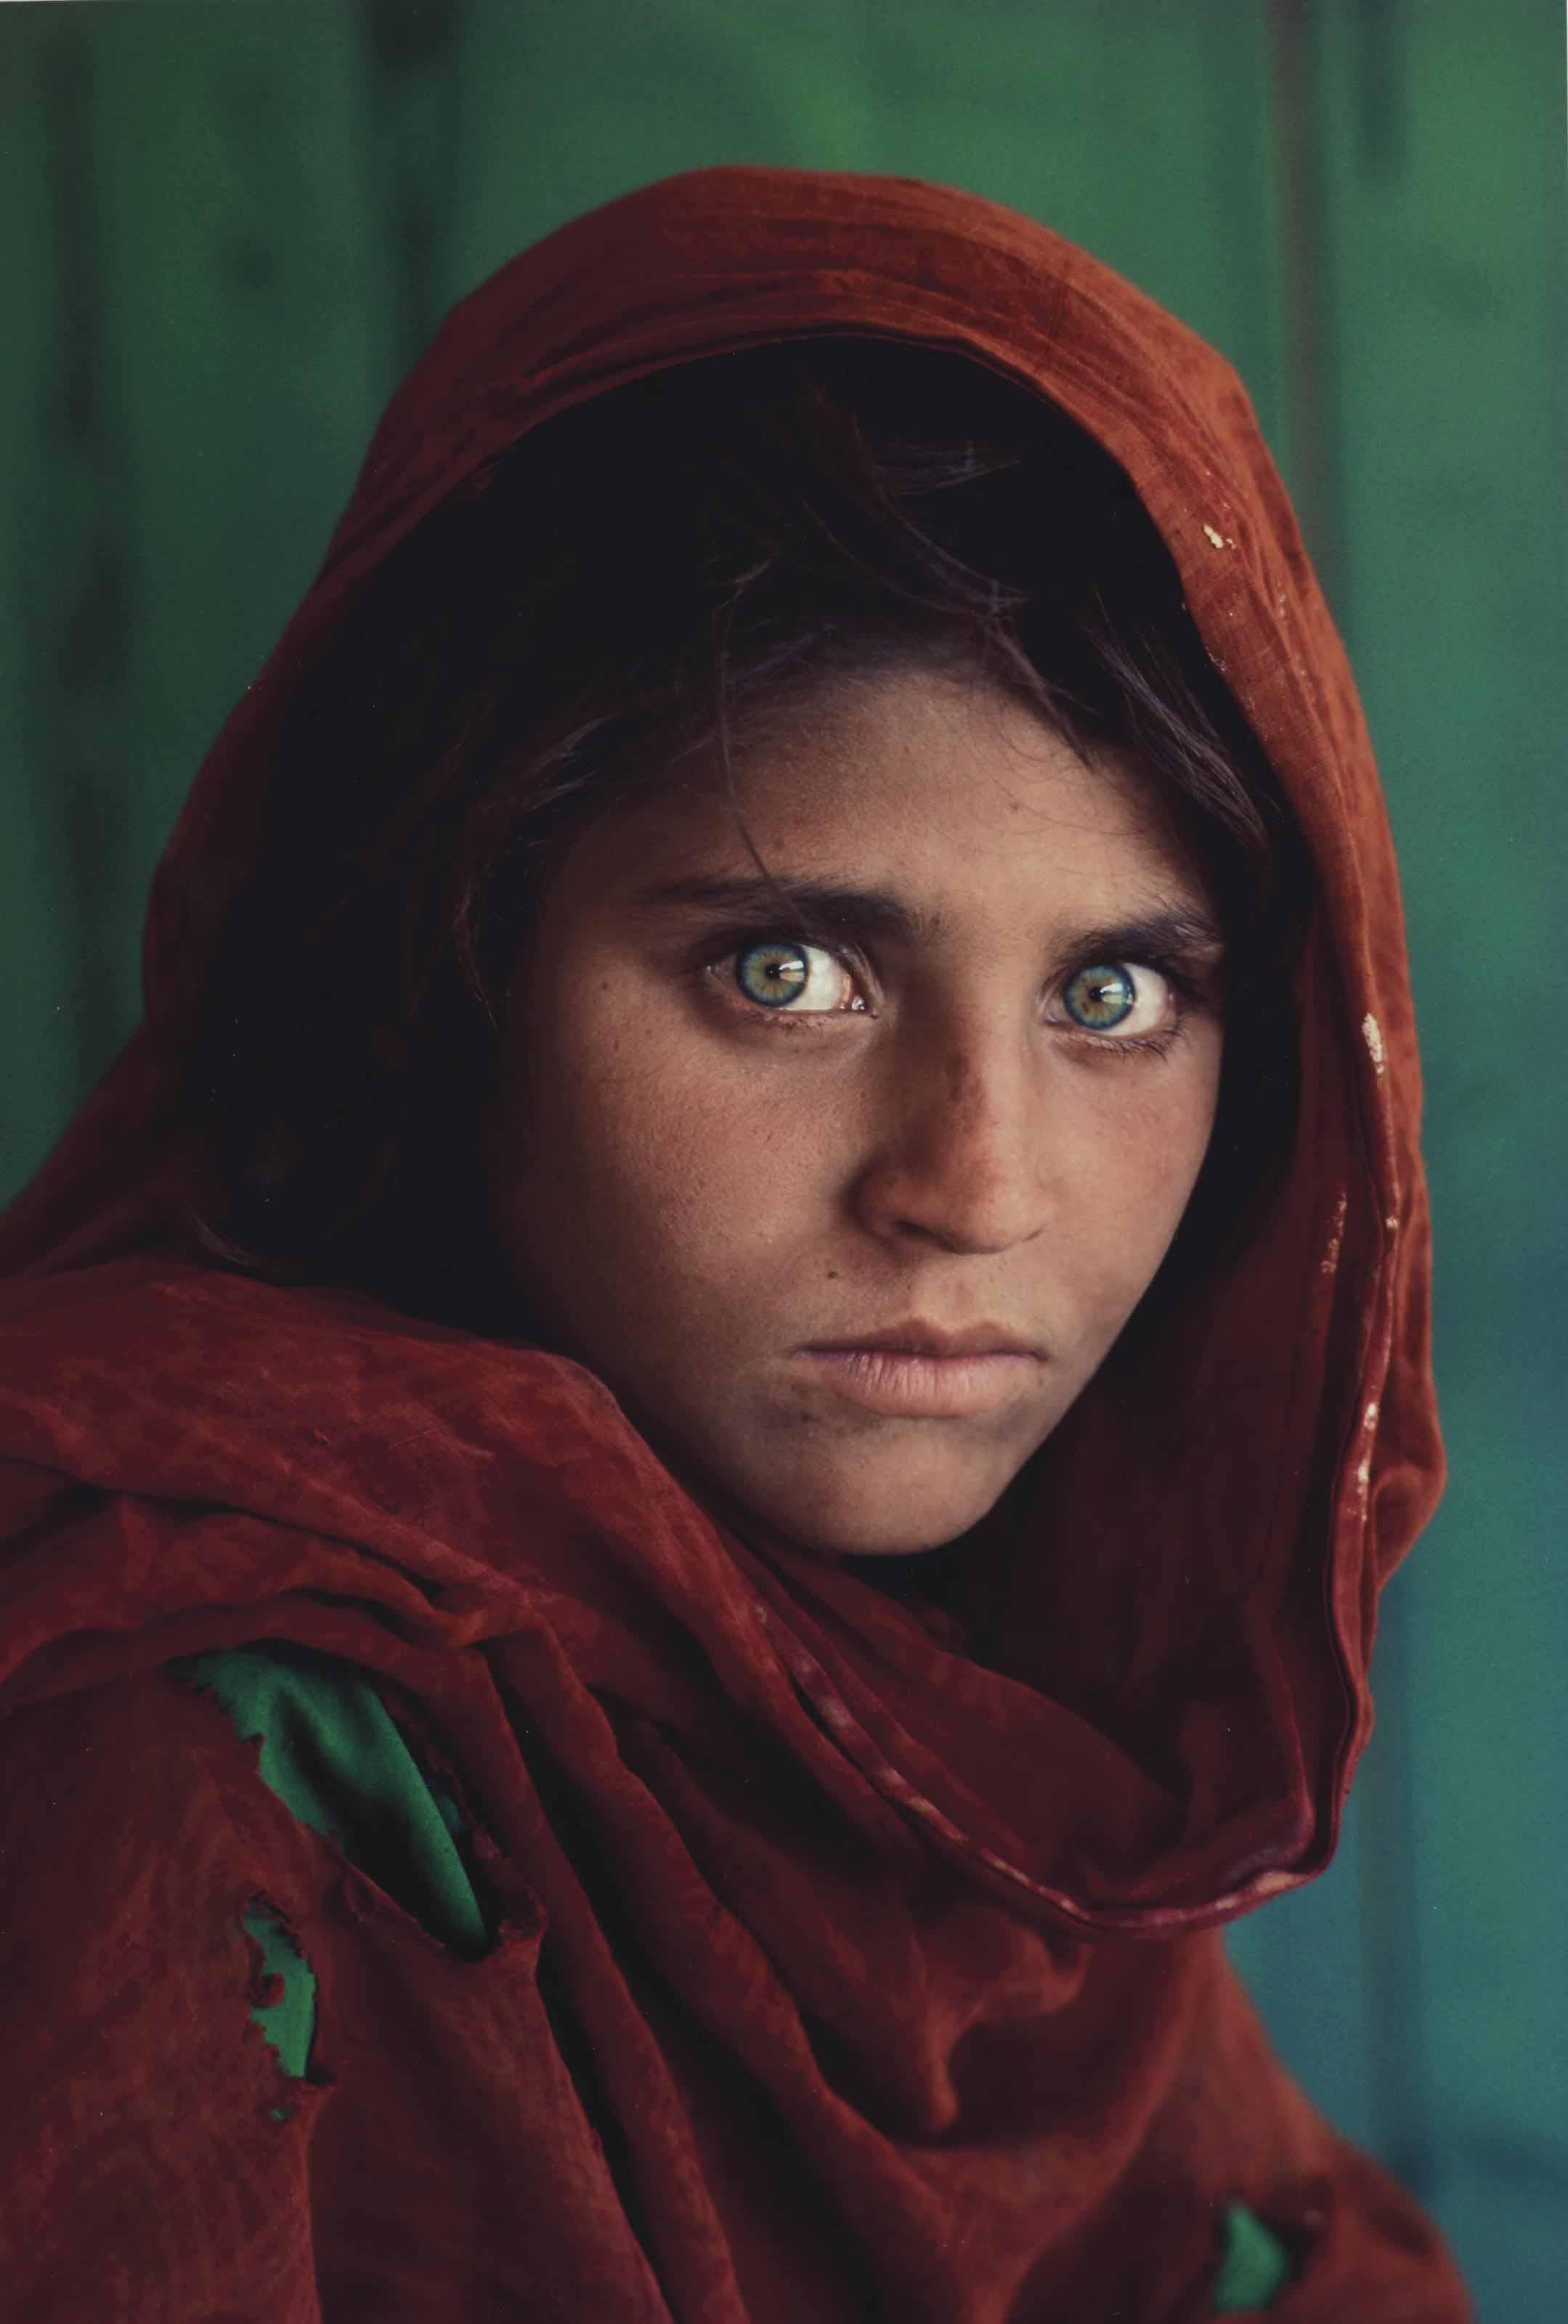 Sharbat Gula, Afghan Girl, Pakistan, 1984